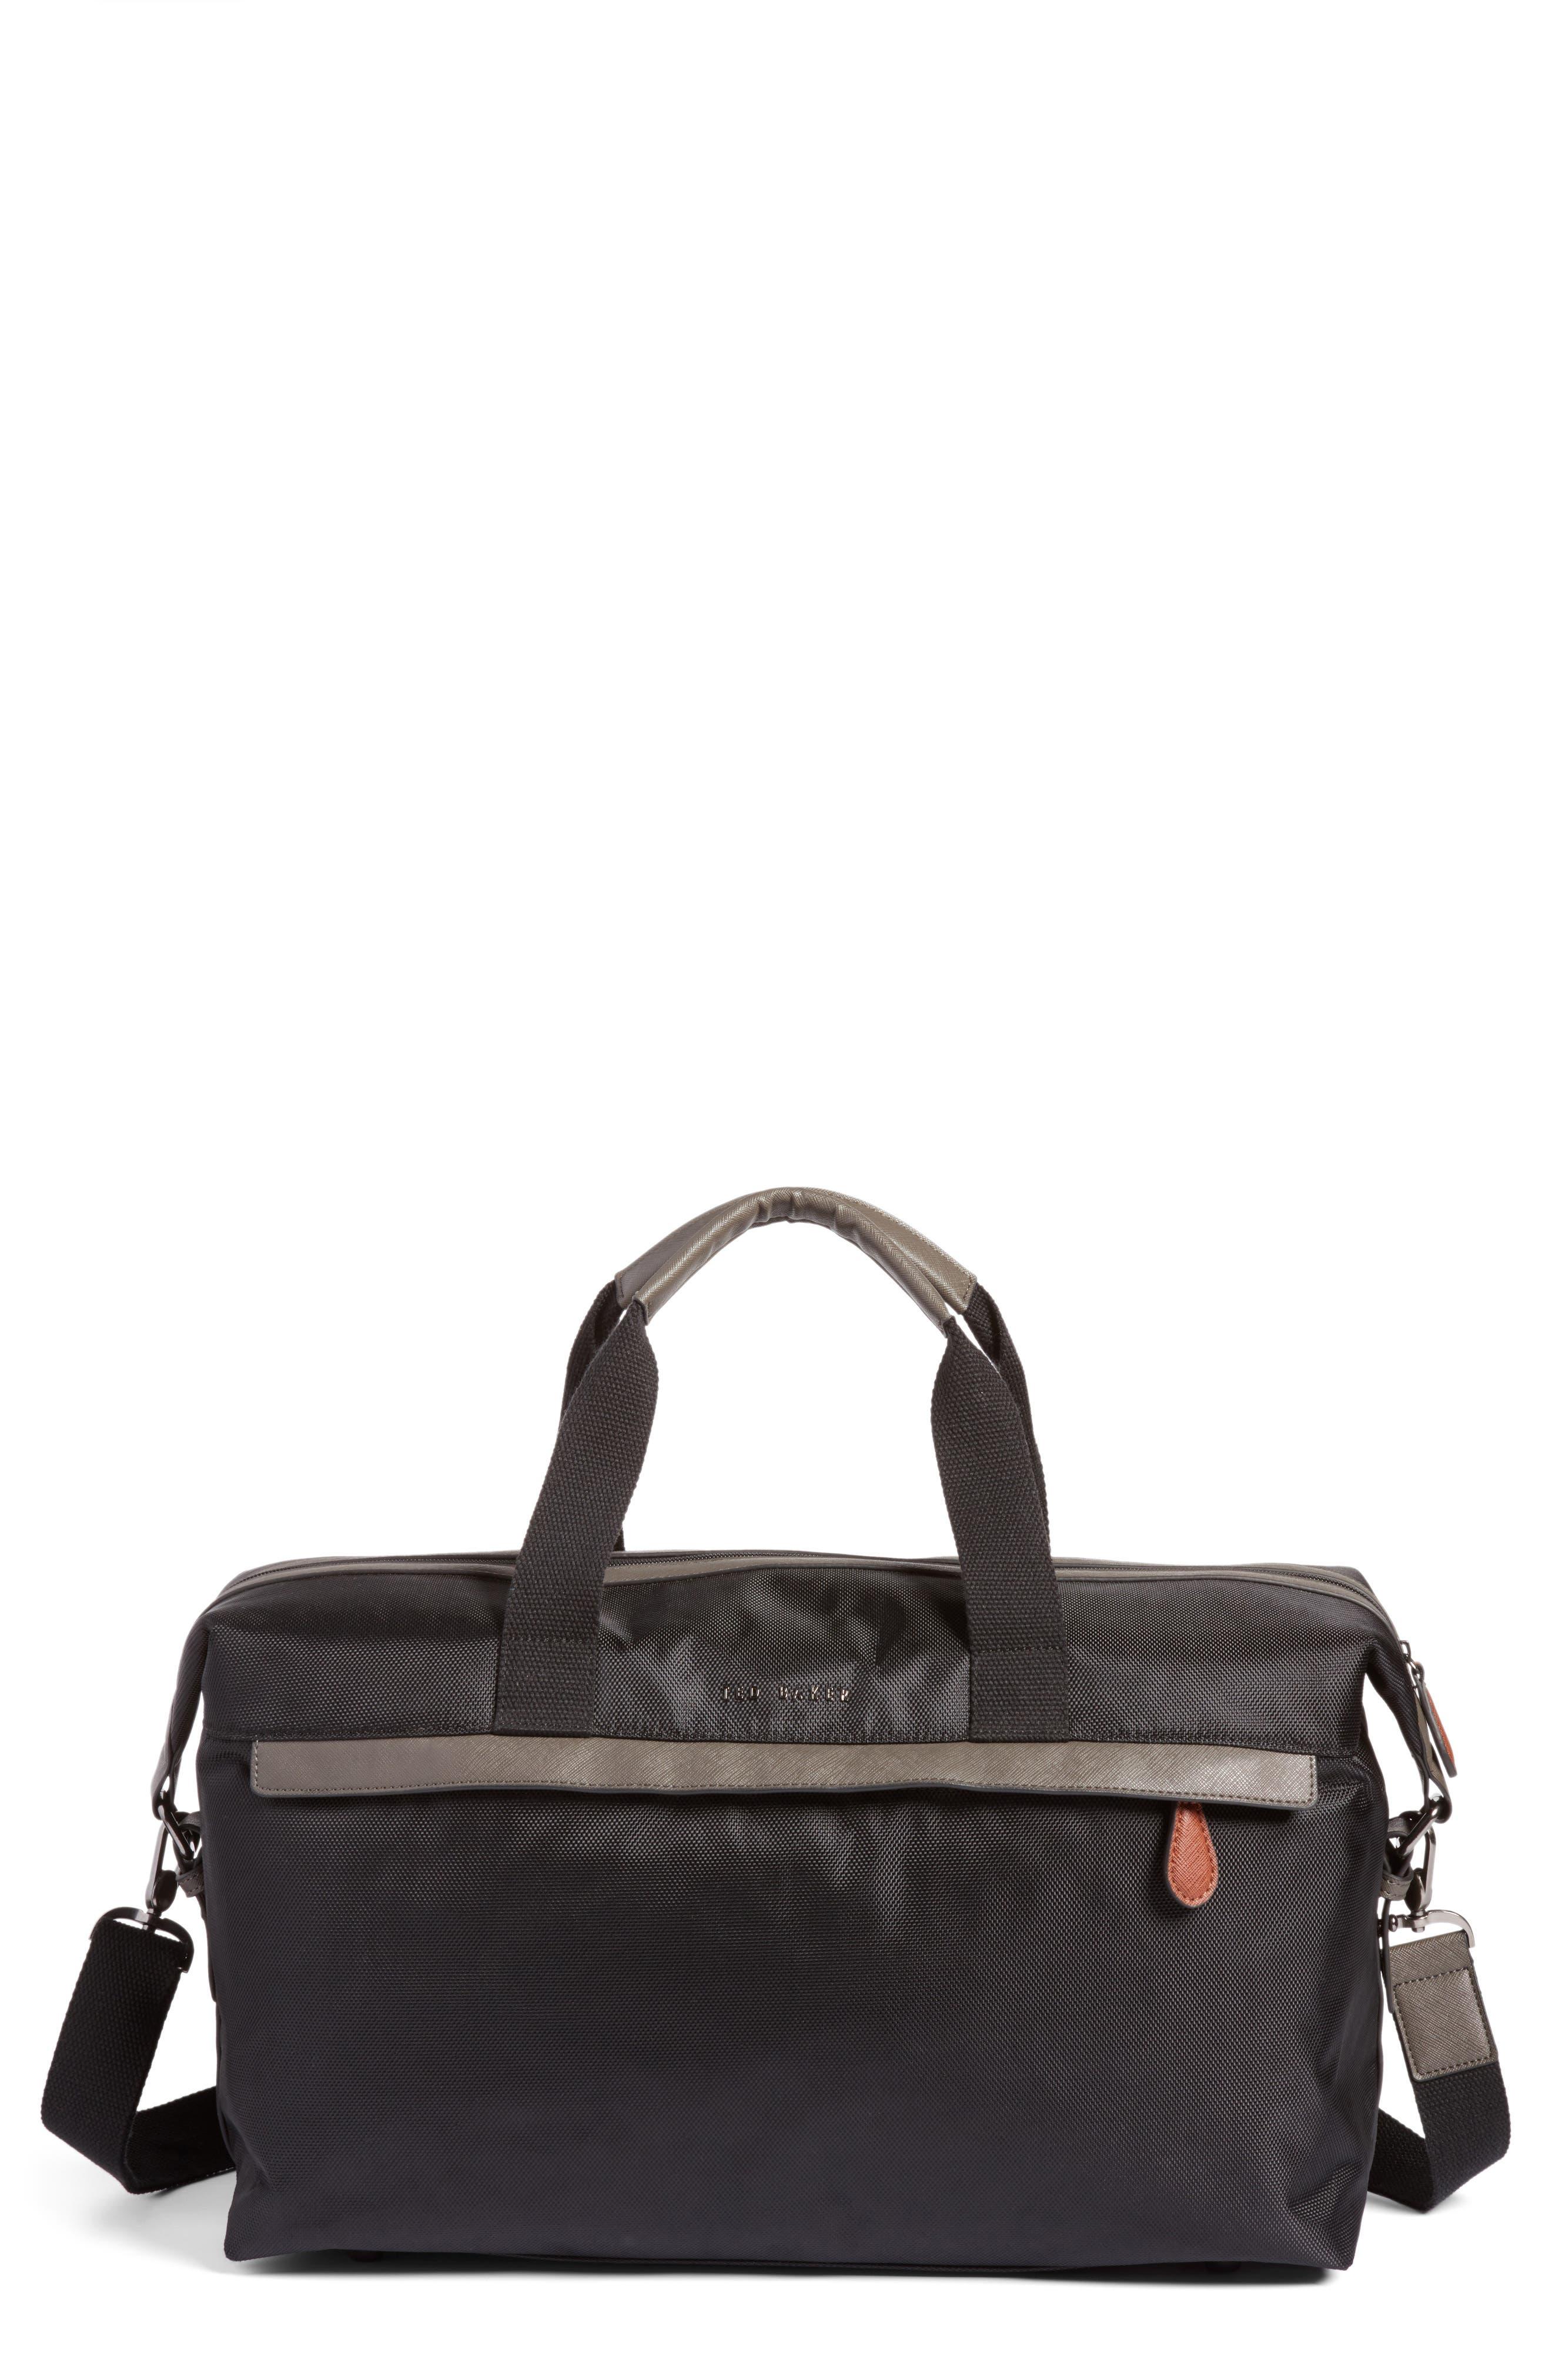 Main Image - Ted Baker London Zeebee Duffel Bag